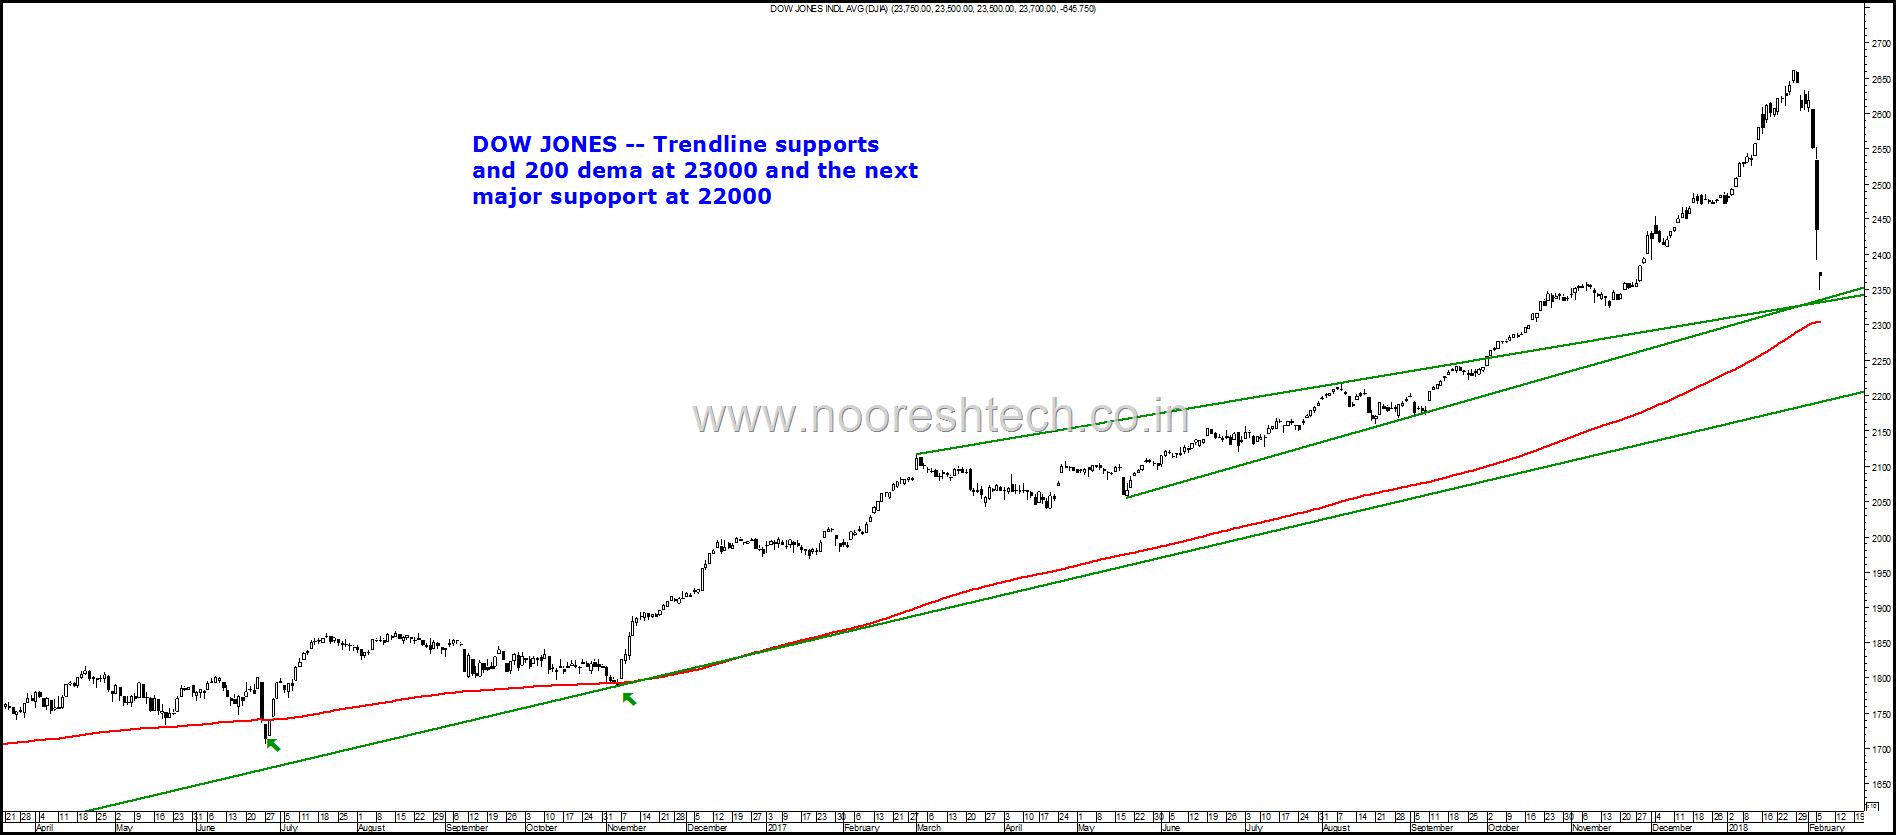 Dow Jones back to 200 dema